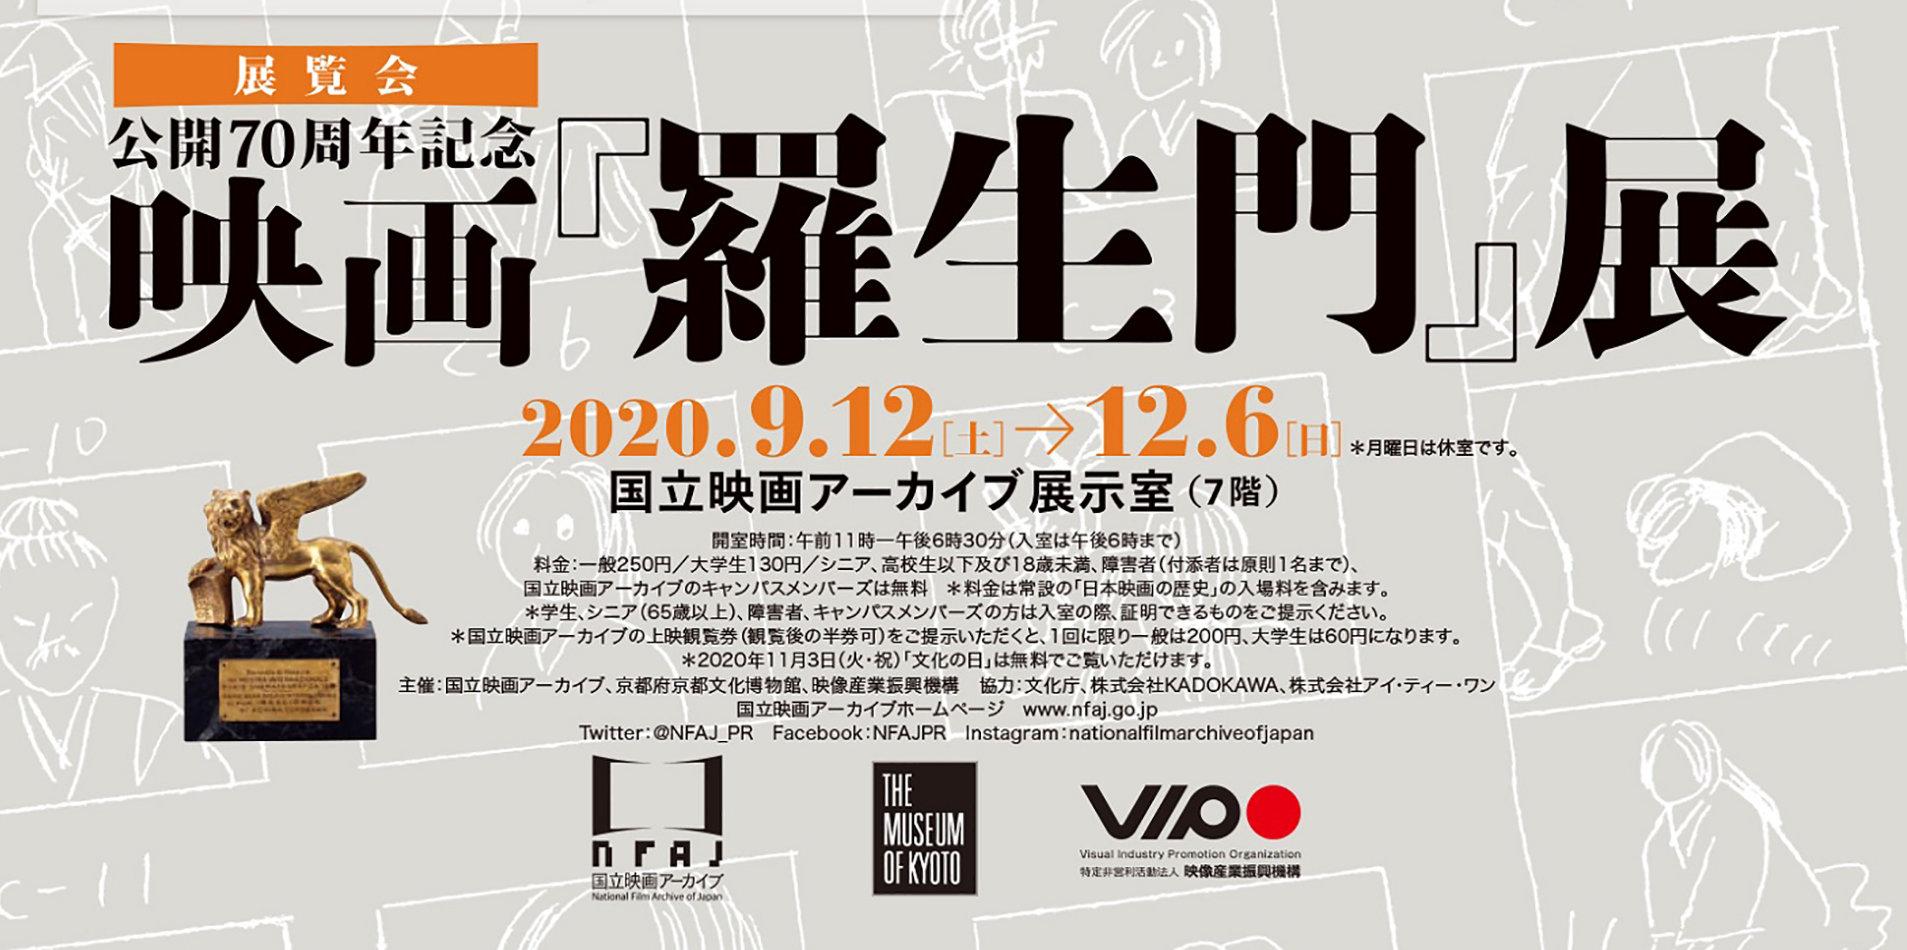 【国立映画アーカイブ】展覧会「公開70周年記念 映画『羅生門』展」